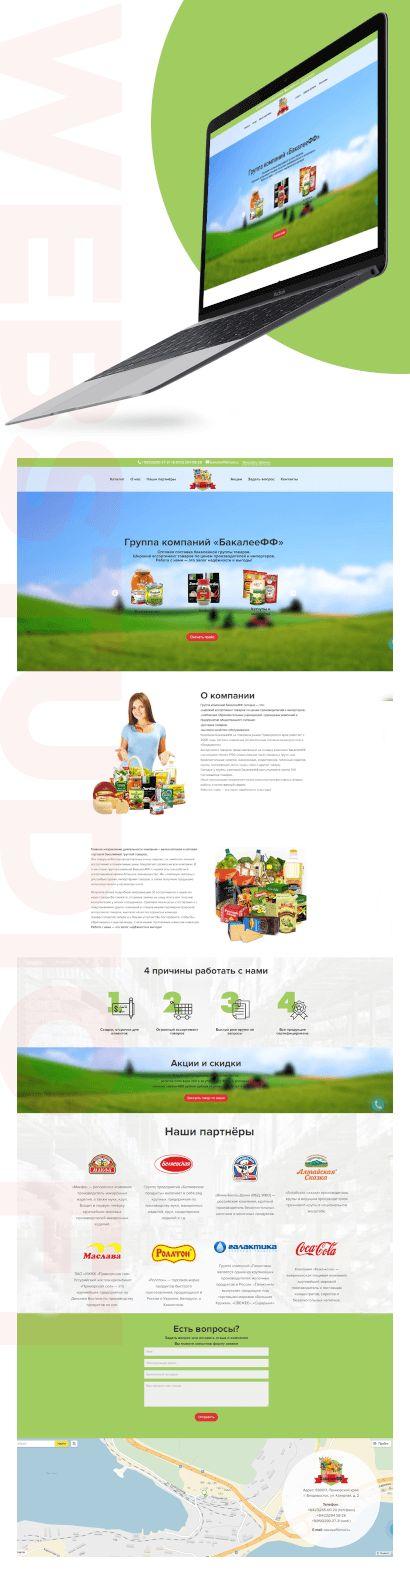 Сайт под ключ, дизайн сайта , сайт визитка, интернет магазин, корпоративный сайт, лендинг пейдж, Landing Page.